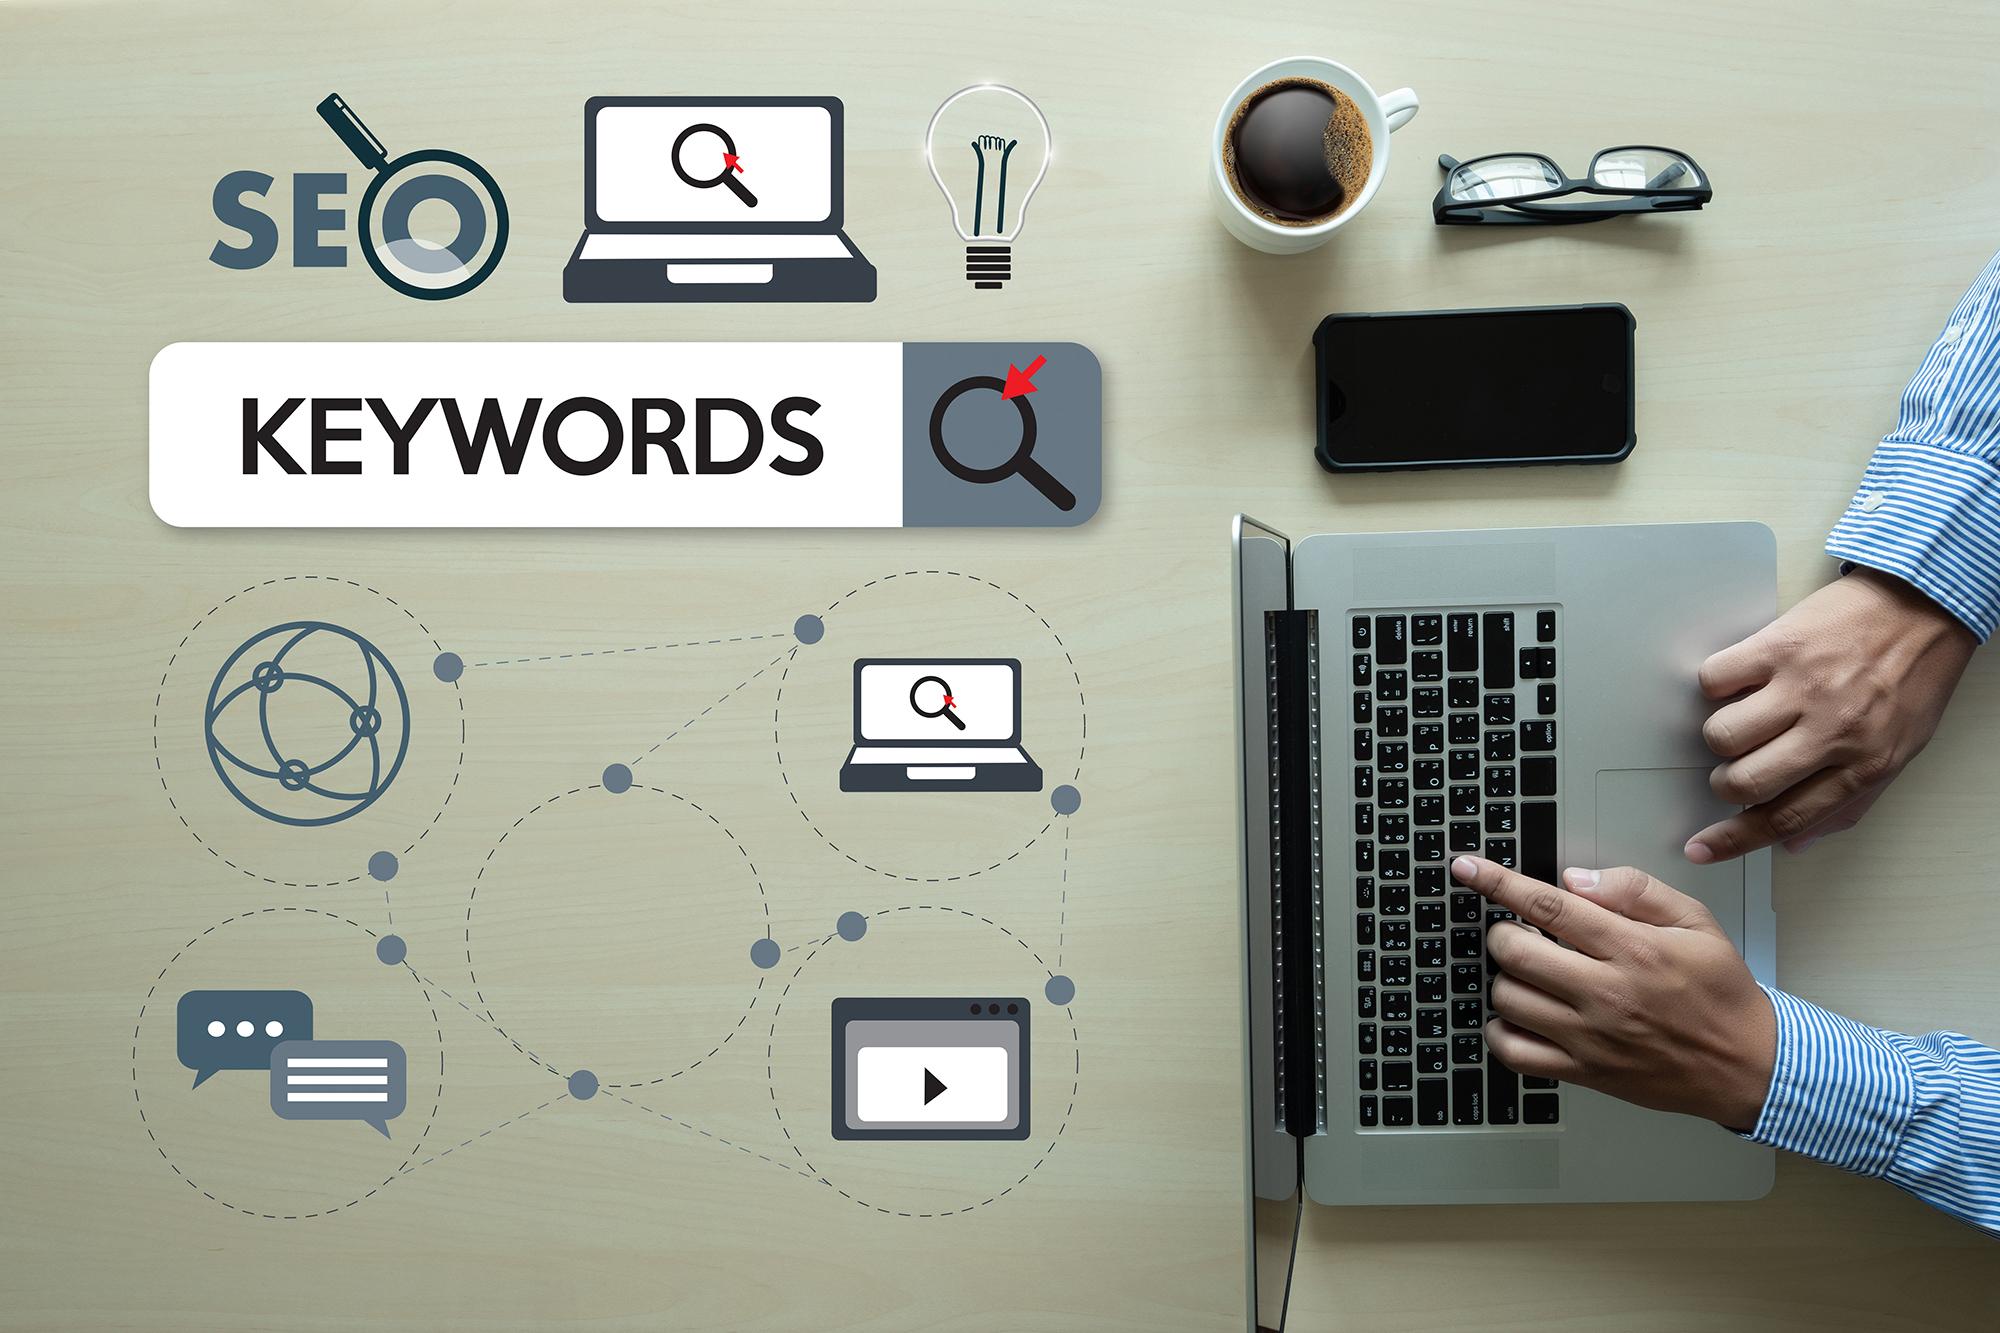 SEOのキーワード選定の手法まとめ!お役立ちツールや無料で使えるWebサイトまで